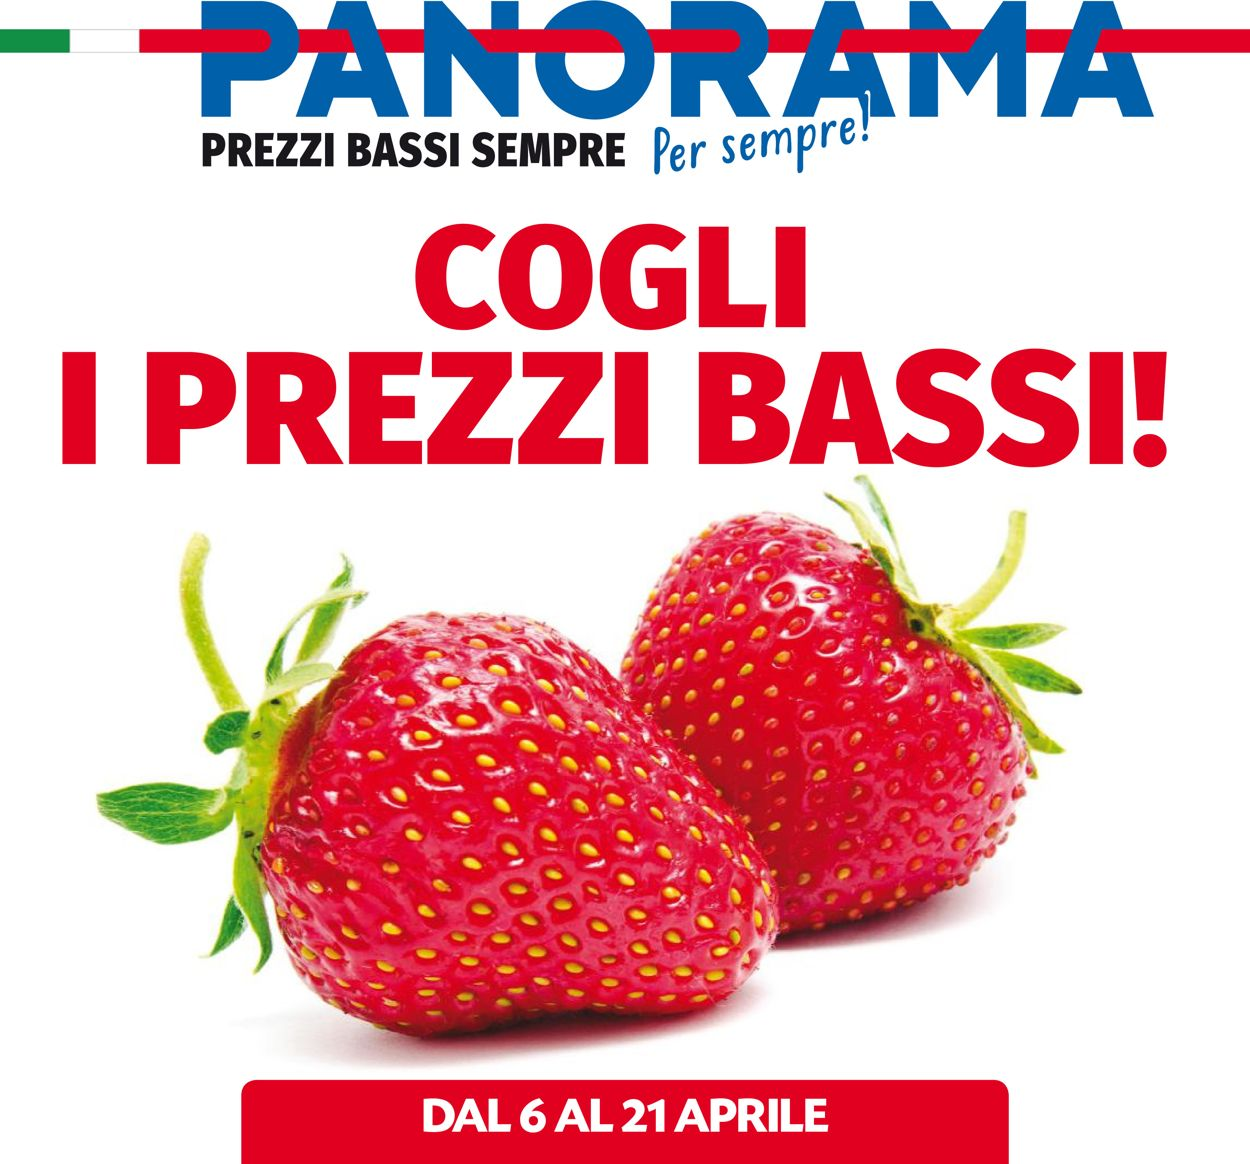 Volantino Pam Panorama - Offerte 06/04-21/04/2021